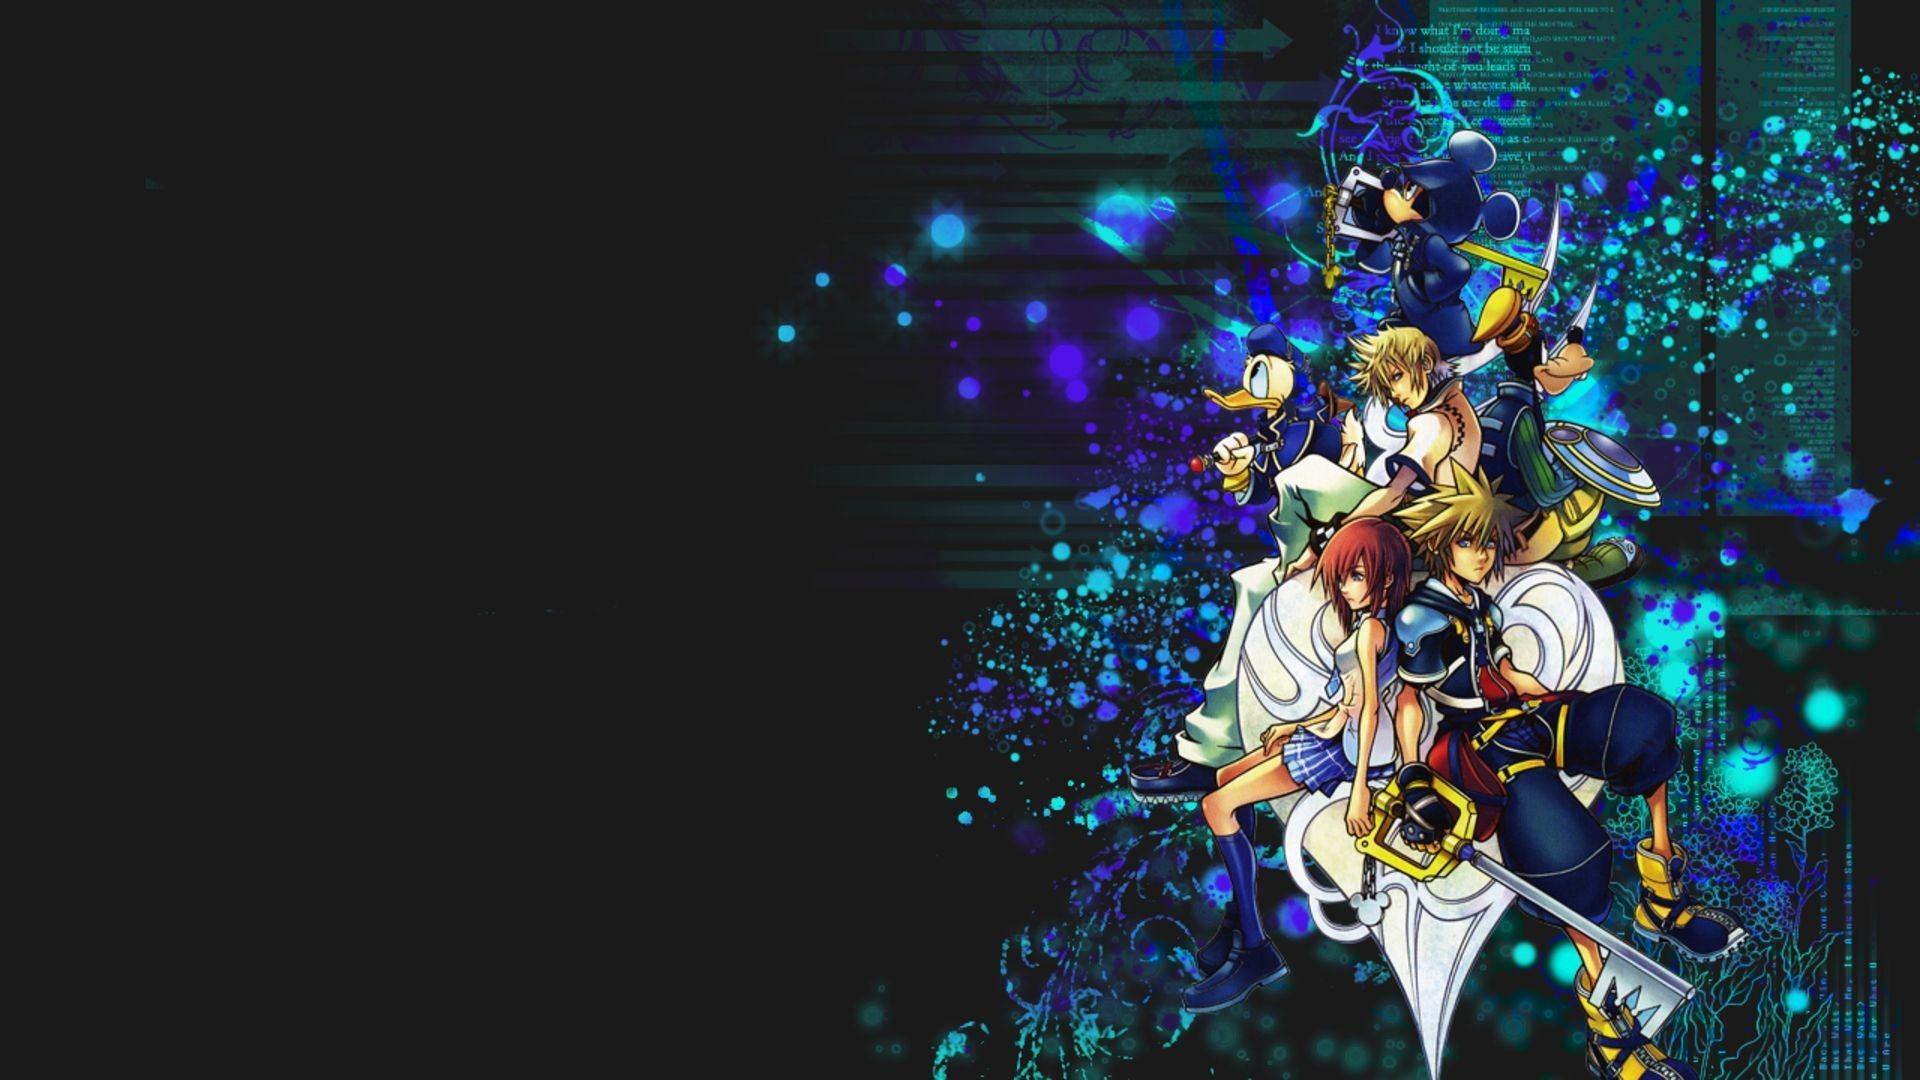 Kingdom Hearts 2 Wallpapers ·① WallpaperTag